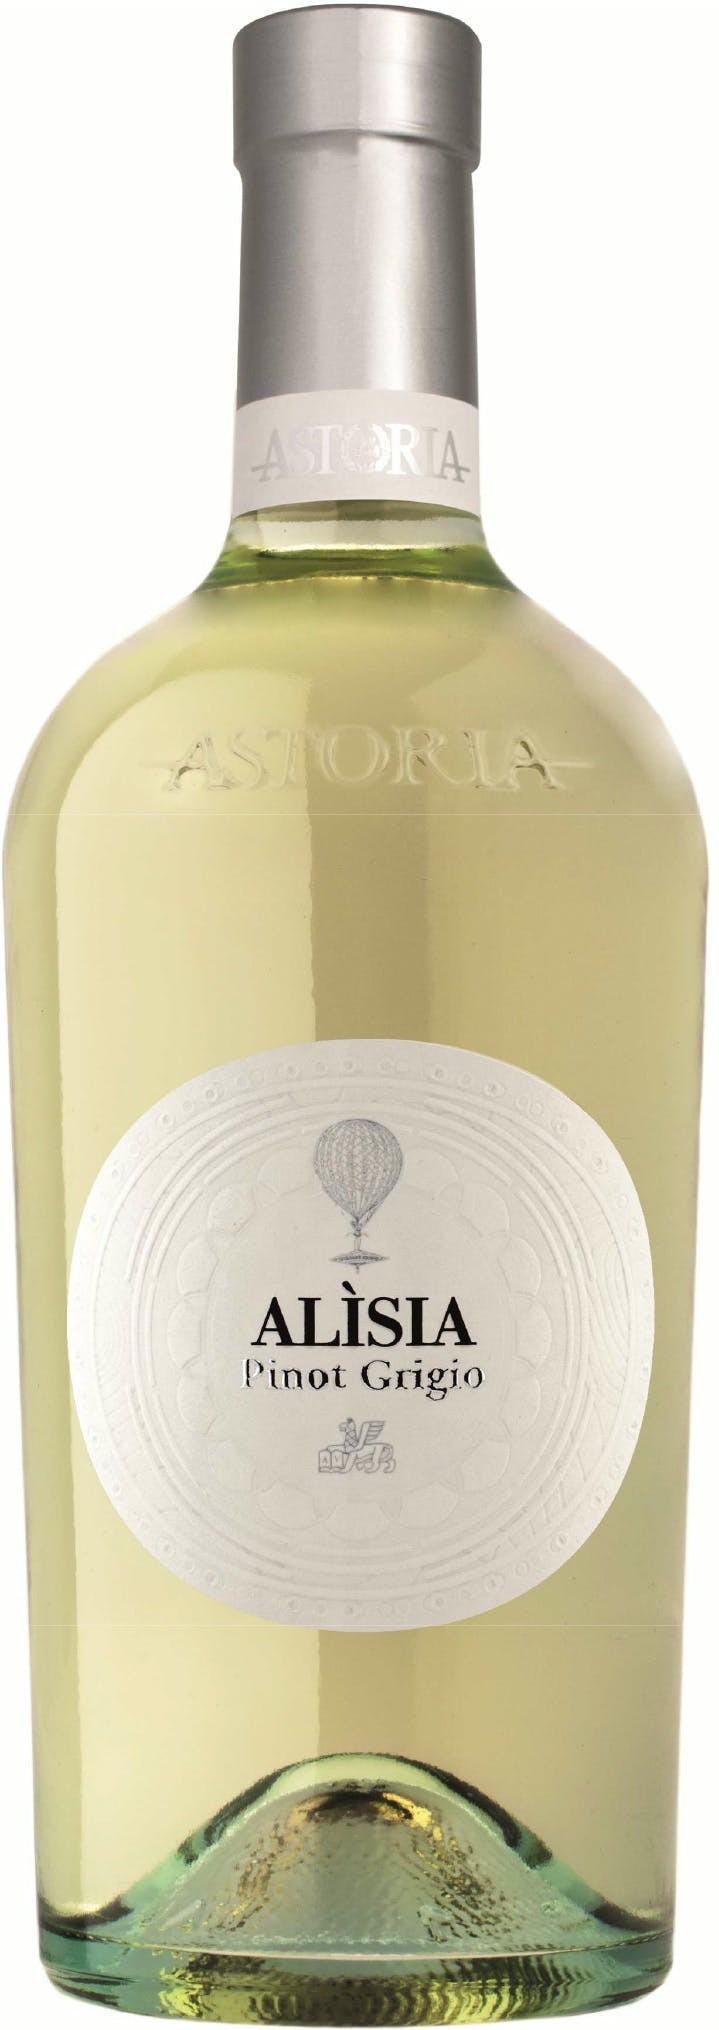 Astoria - Alìsia - Venecia - Italia - 2018